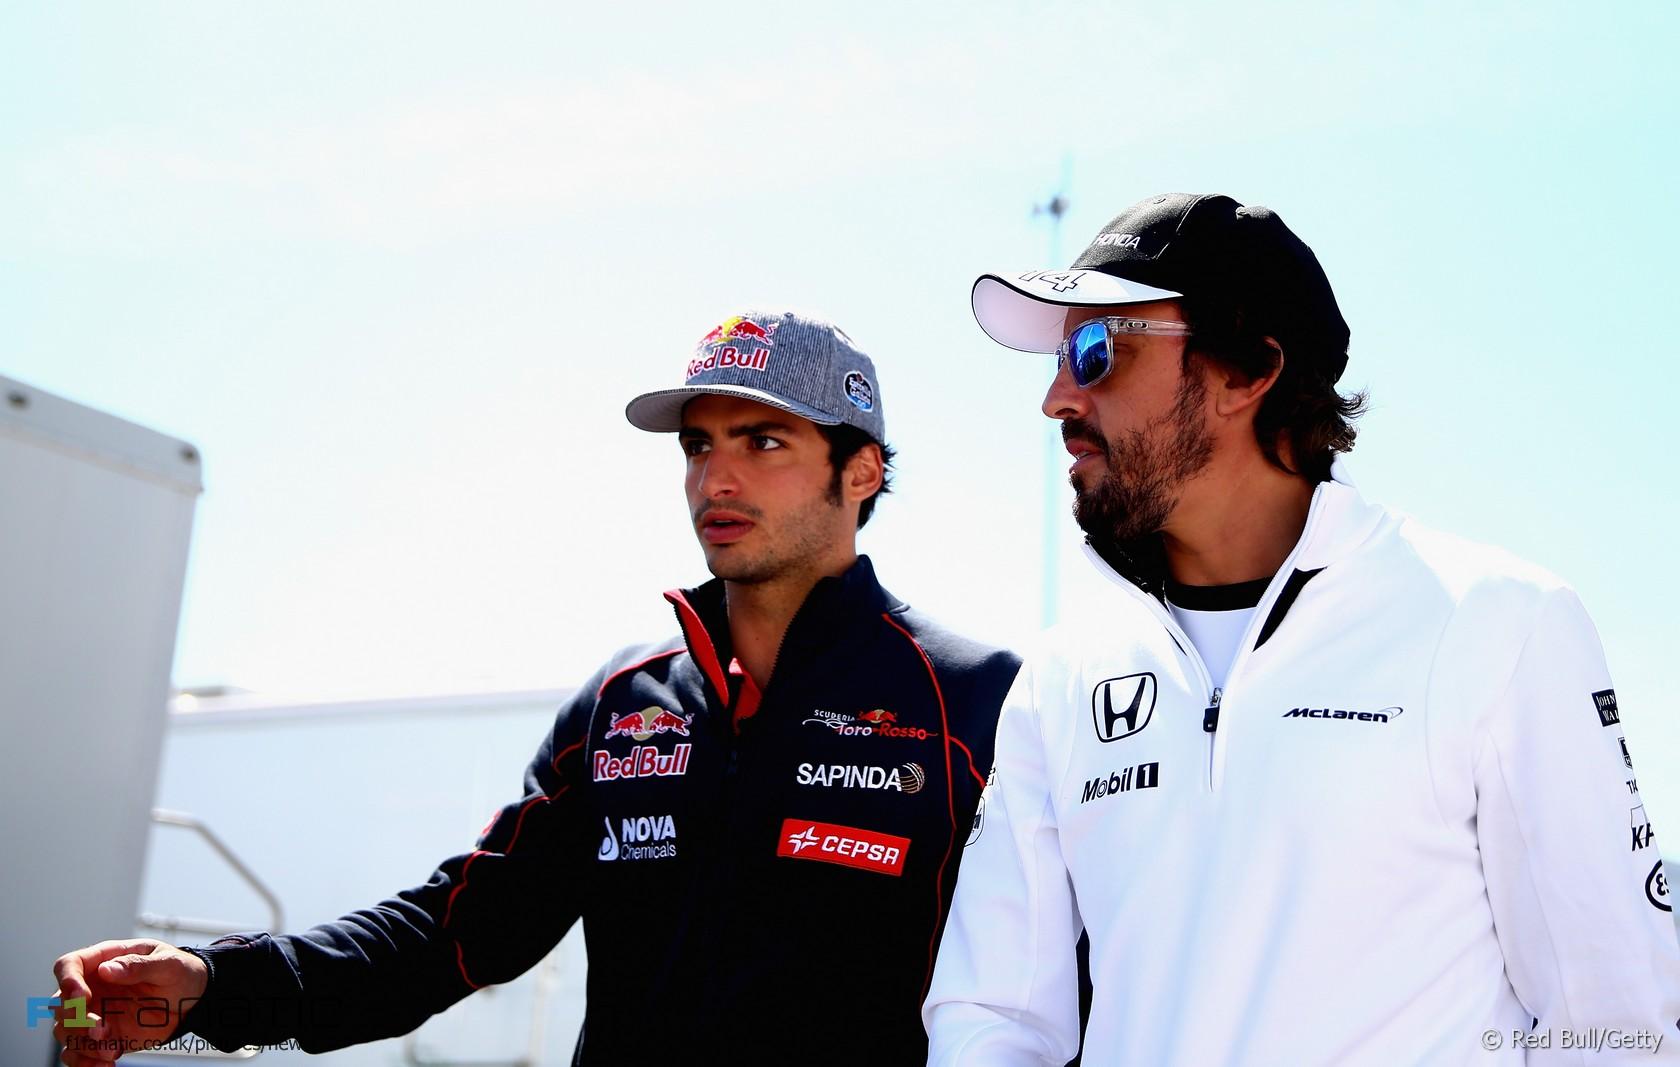 Carlos Sainz Jnr, Fernando Alonso, Circuit Gilles Villeneuve, 2015